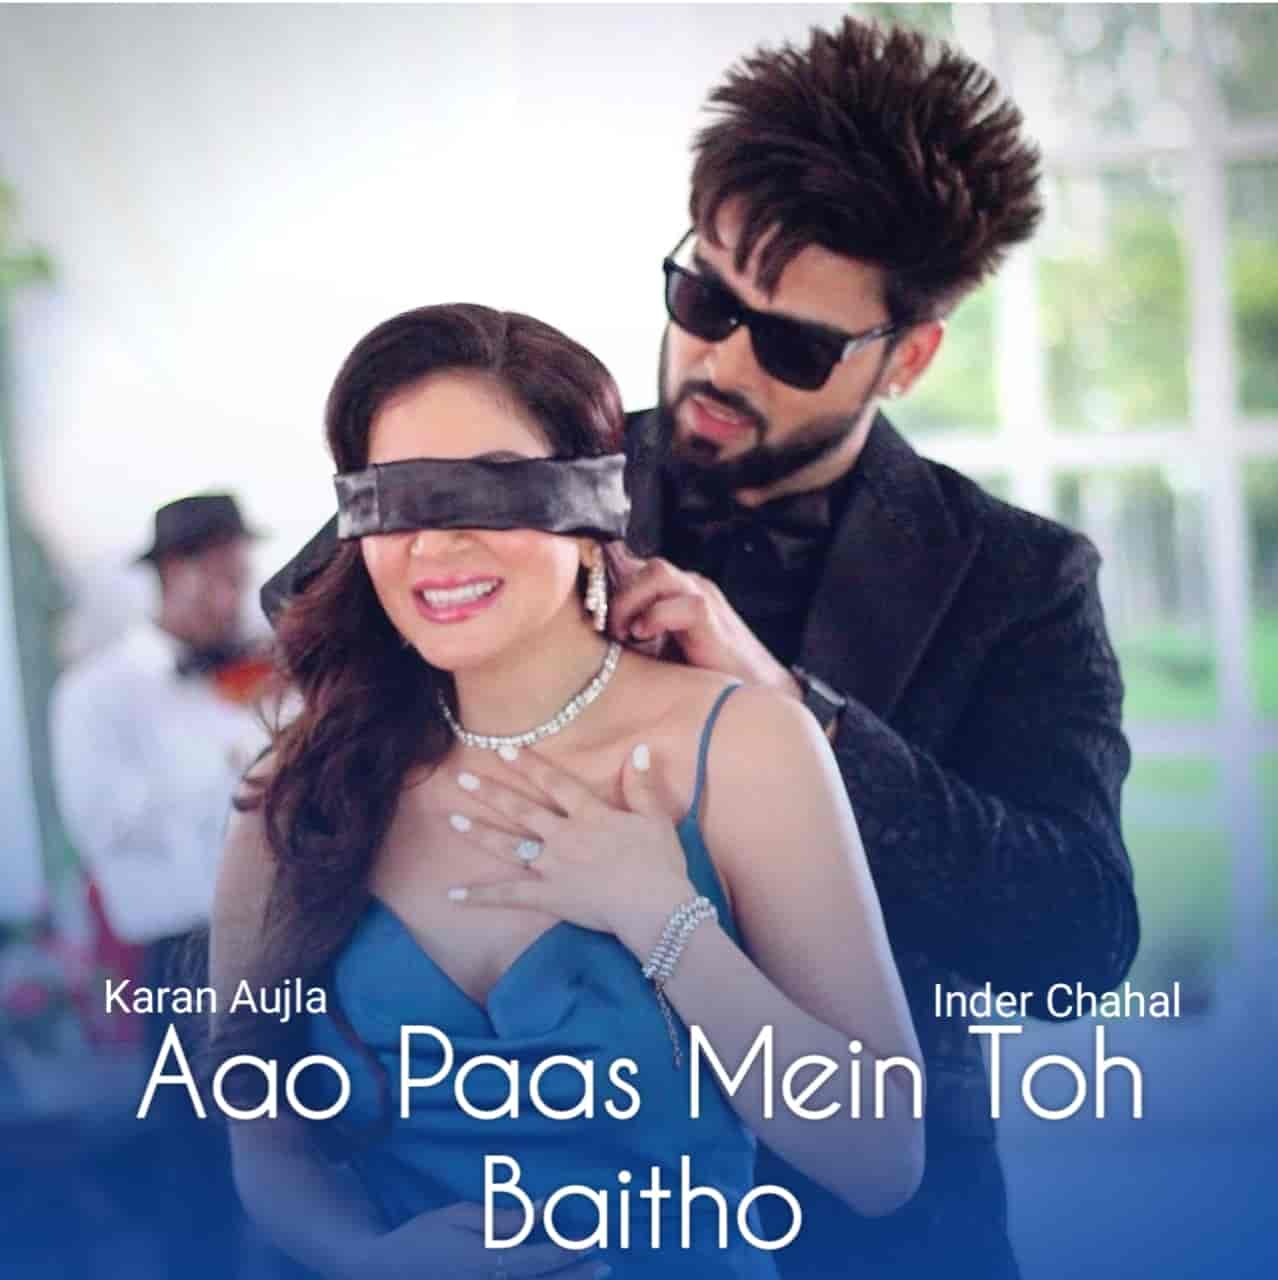 Aao Paas Me To Baitho Song Lyrics Karan Aujla